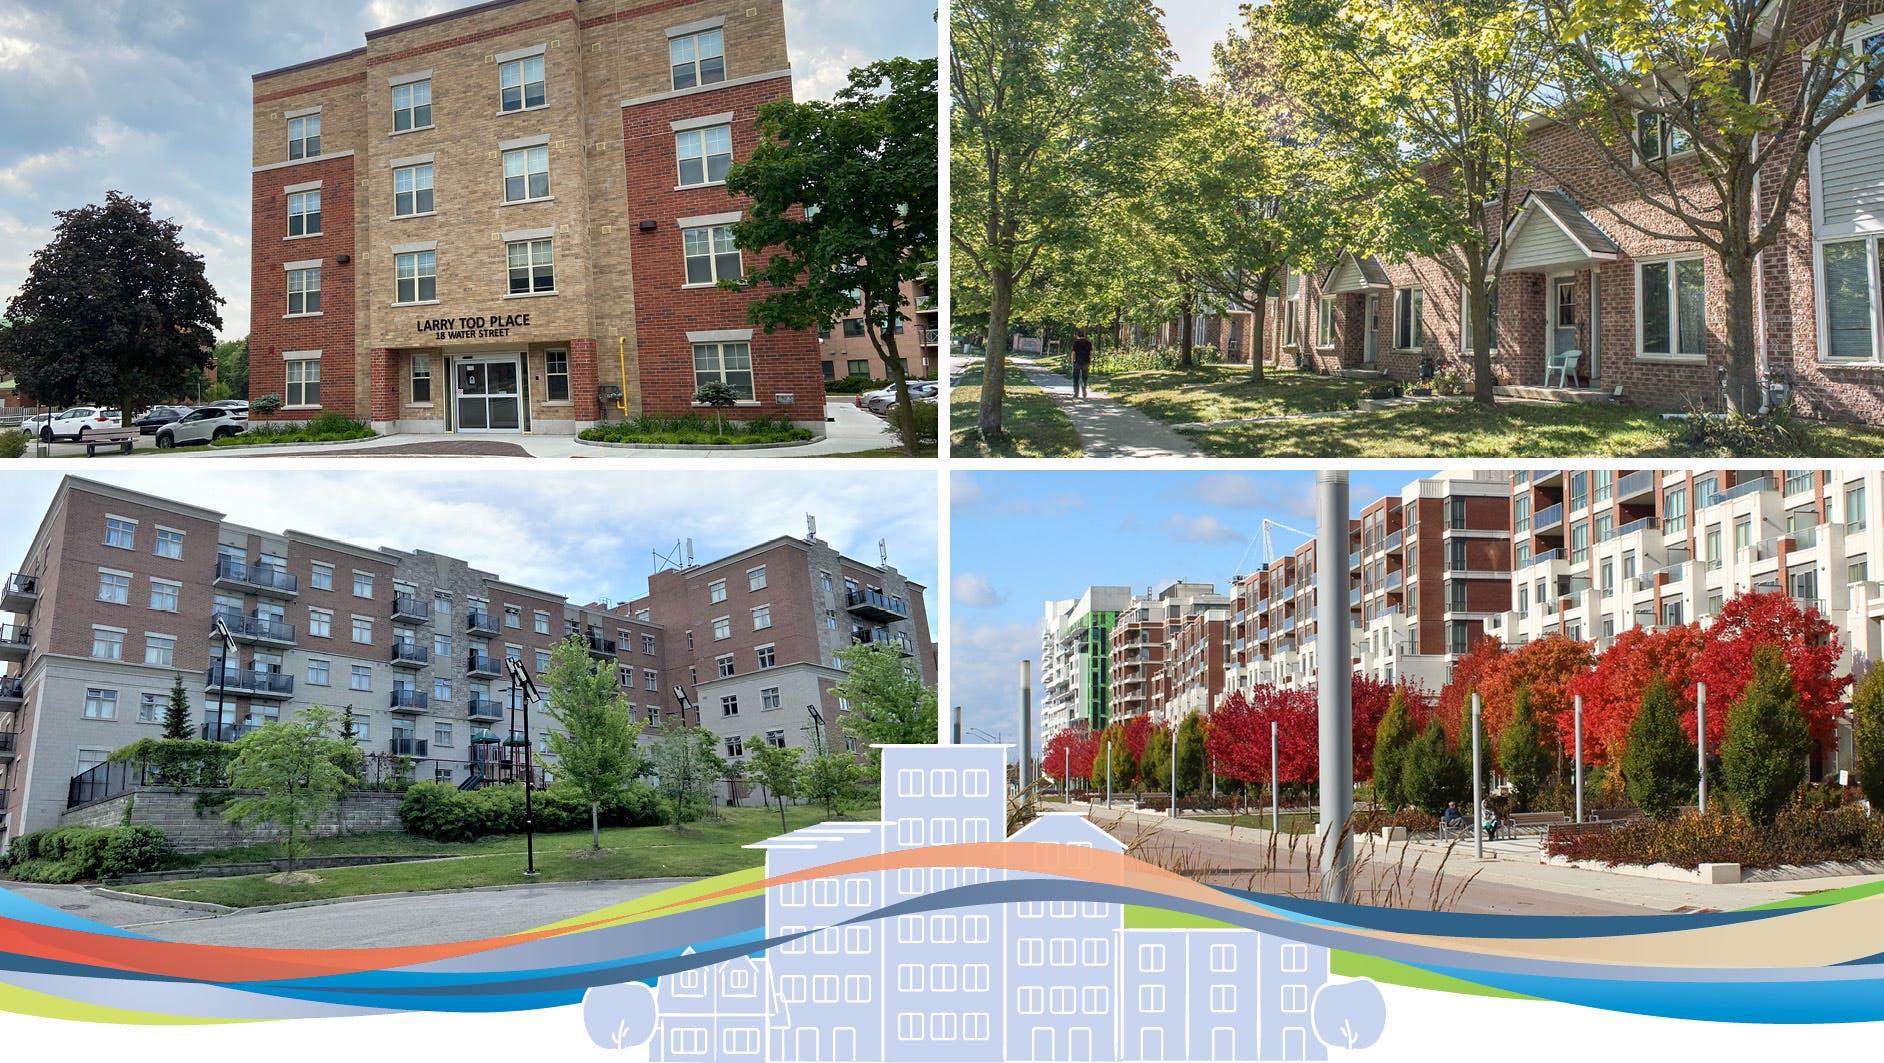 Variety of multi-residential residences